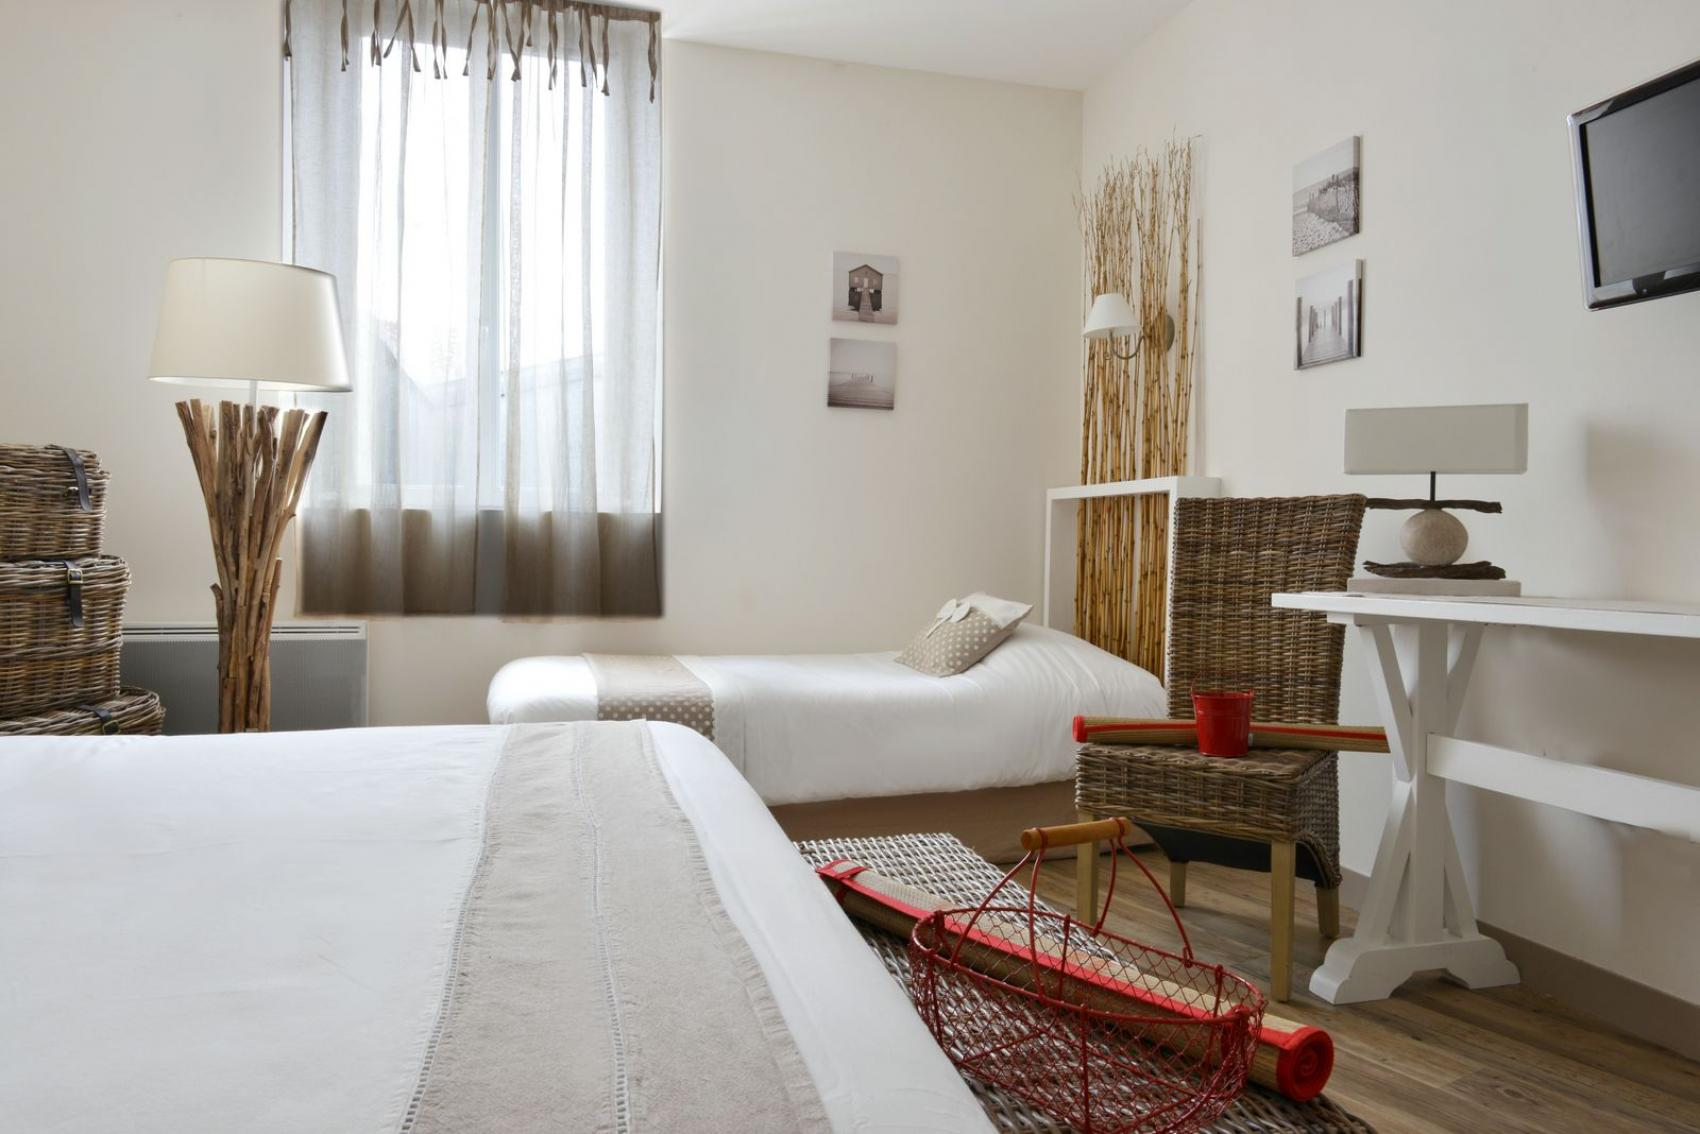 Zimmers fouras charente maritime grand h tel des bains for Hotel fouras grand hotel des bains